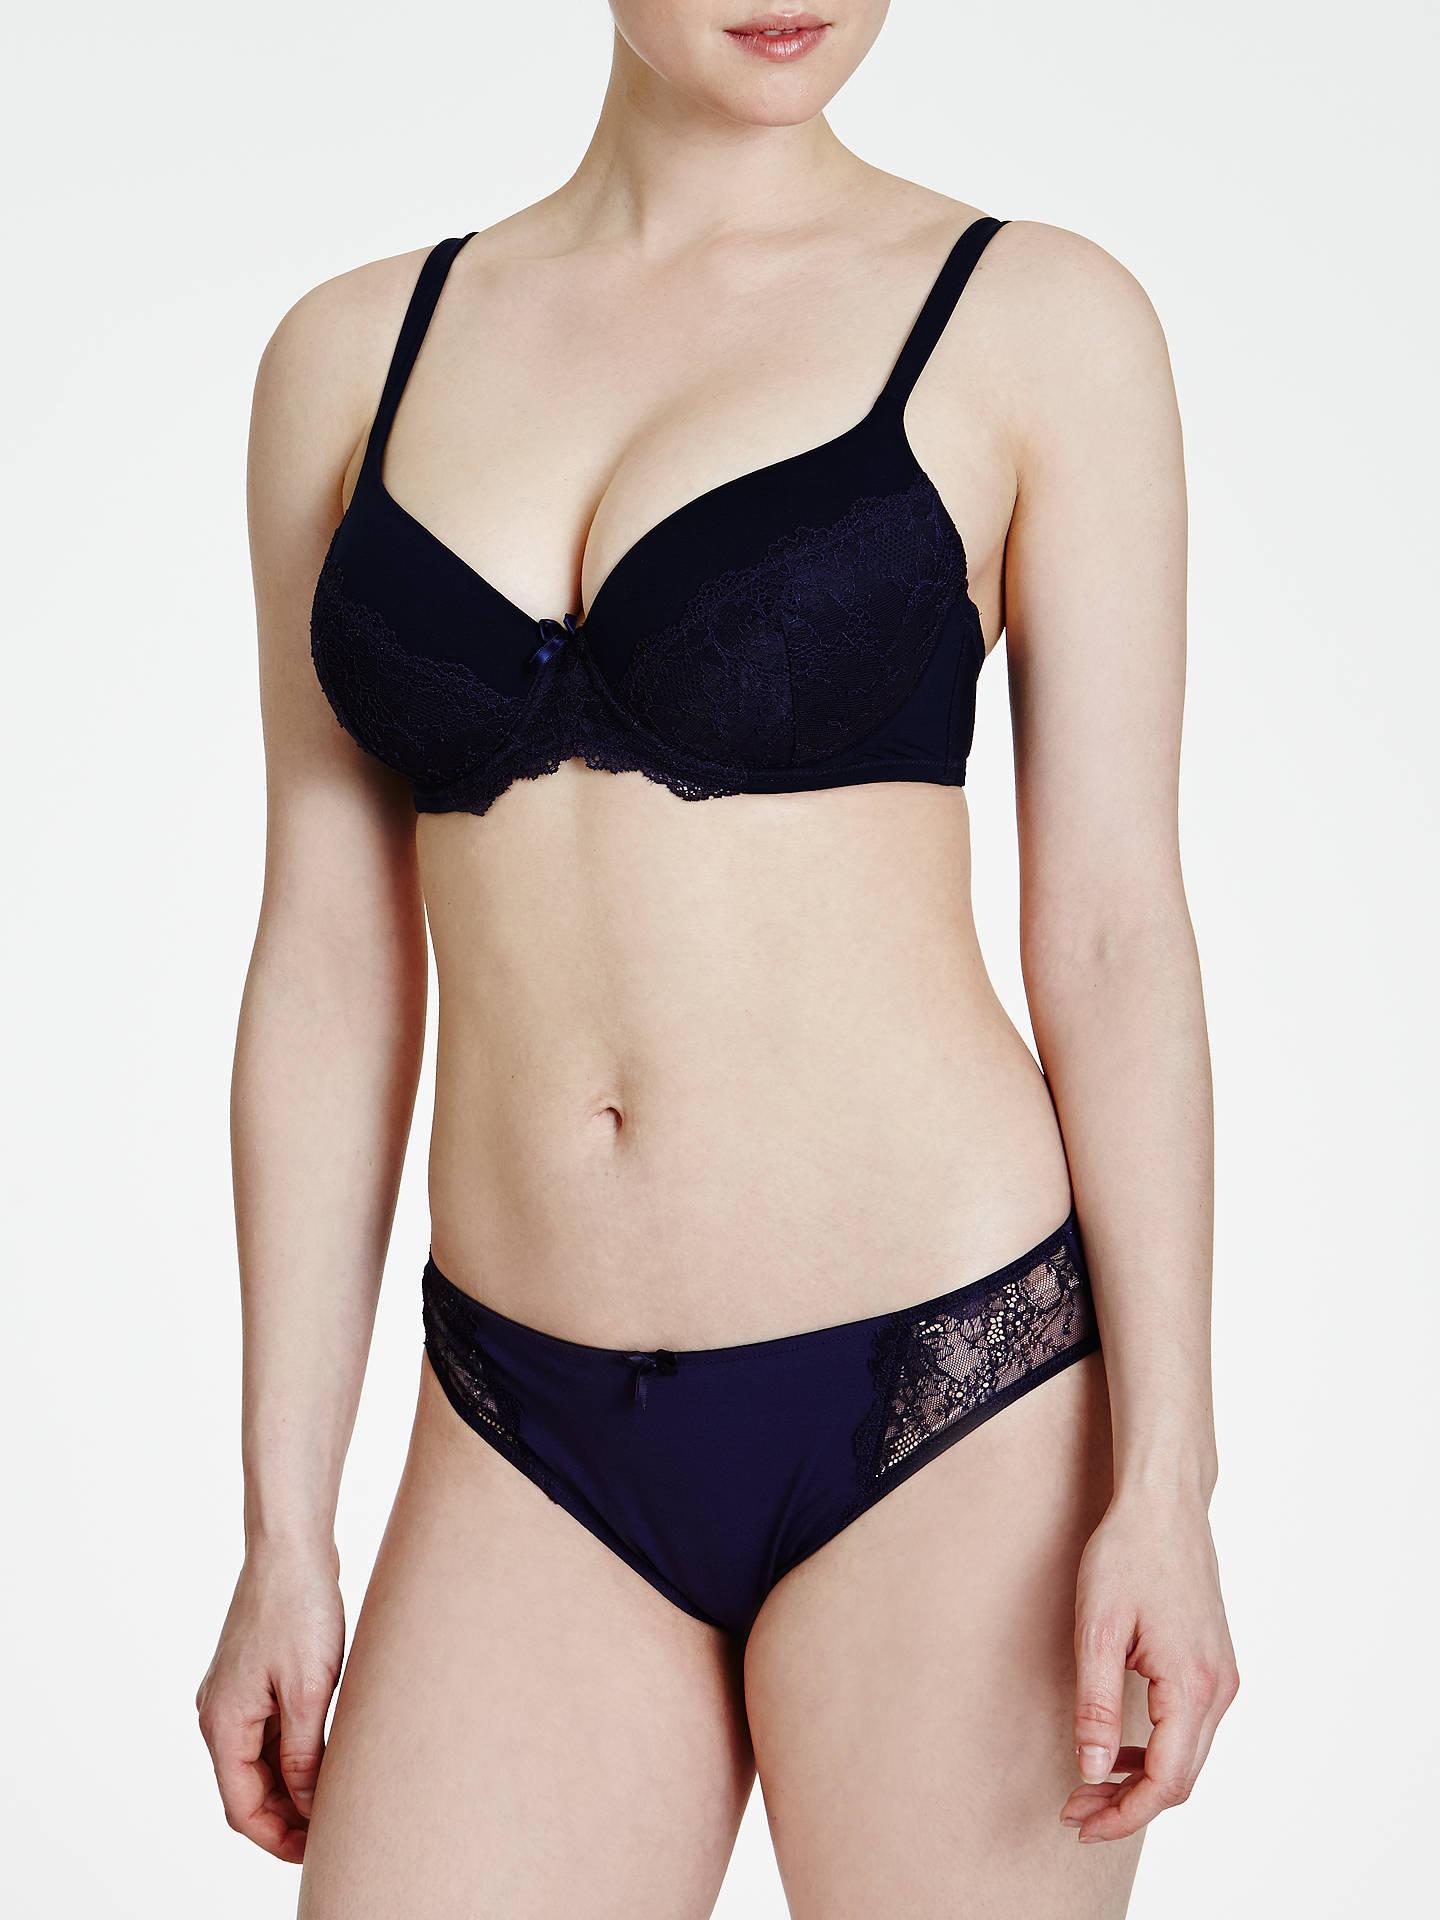 John Lewis Sophia Lace Detail Briefs Black//Cream Choose Your Size Free P/&P UK